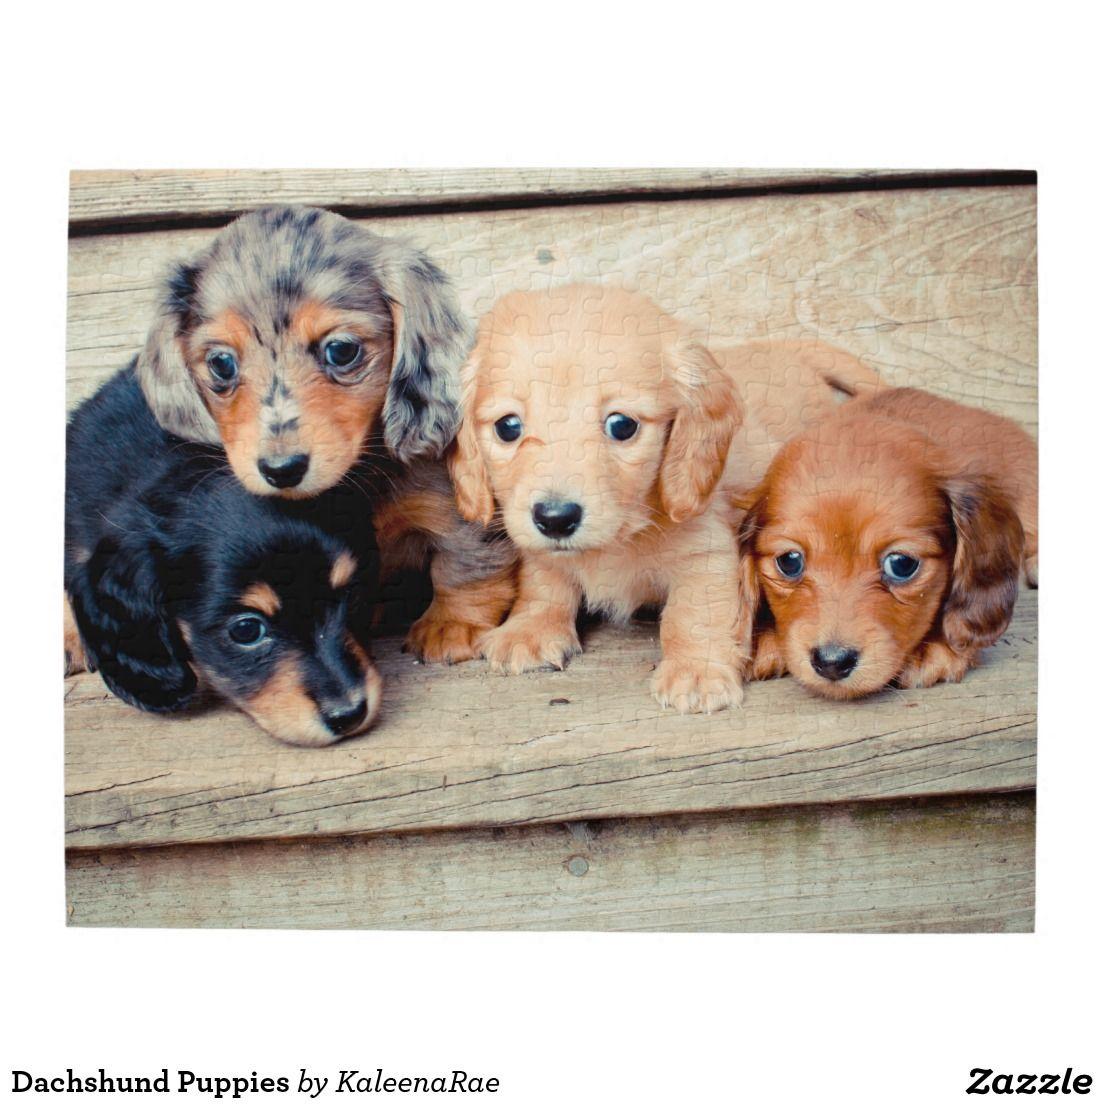 Dachshund Puppies Jigsaw Puzzle Zazzle Com Dachshund Puppies